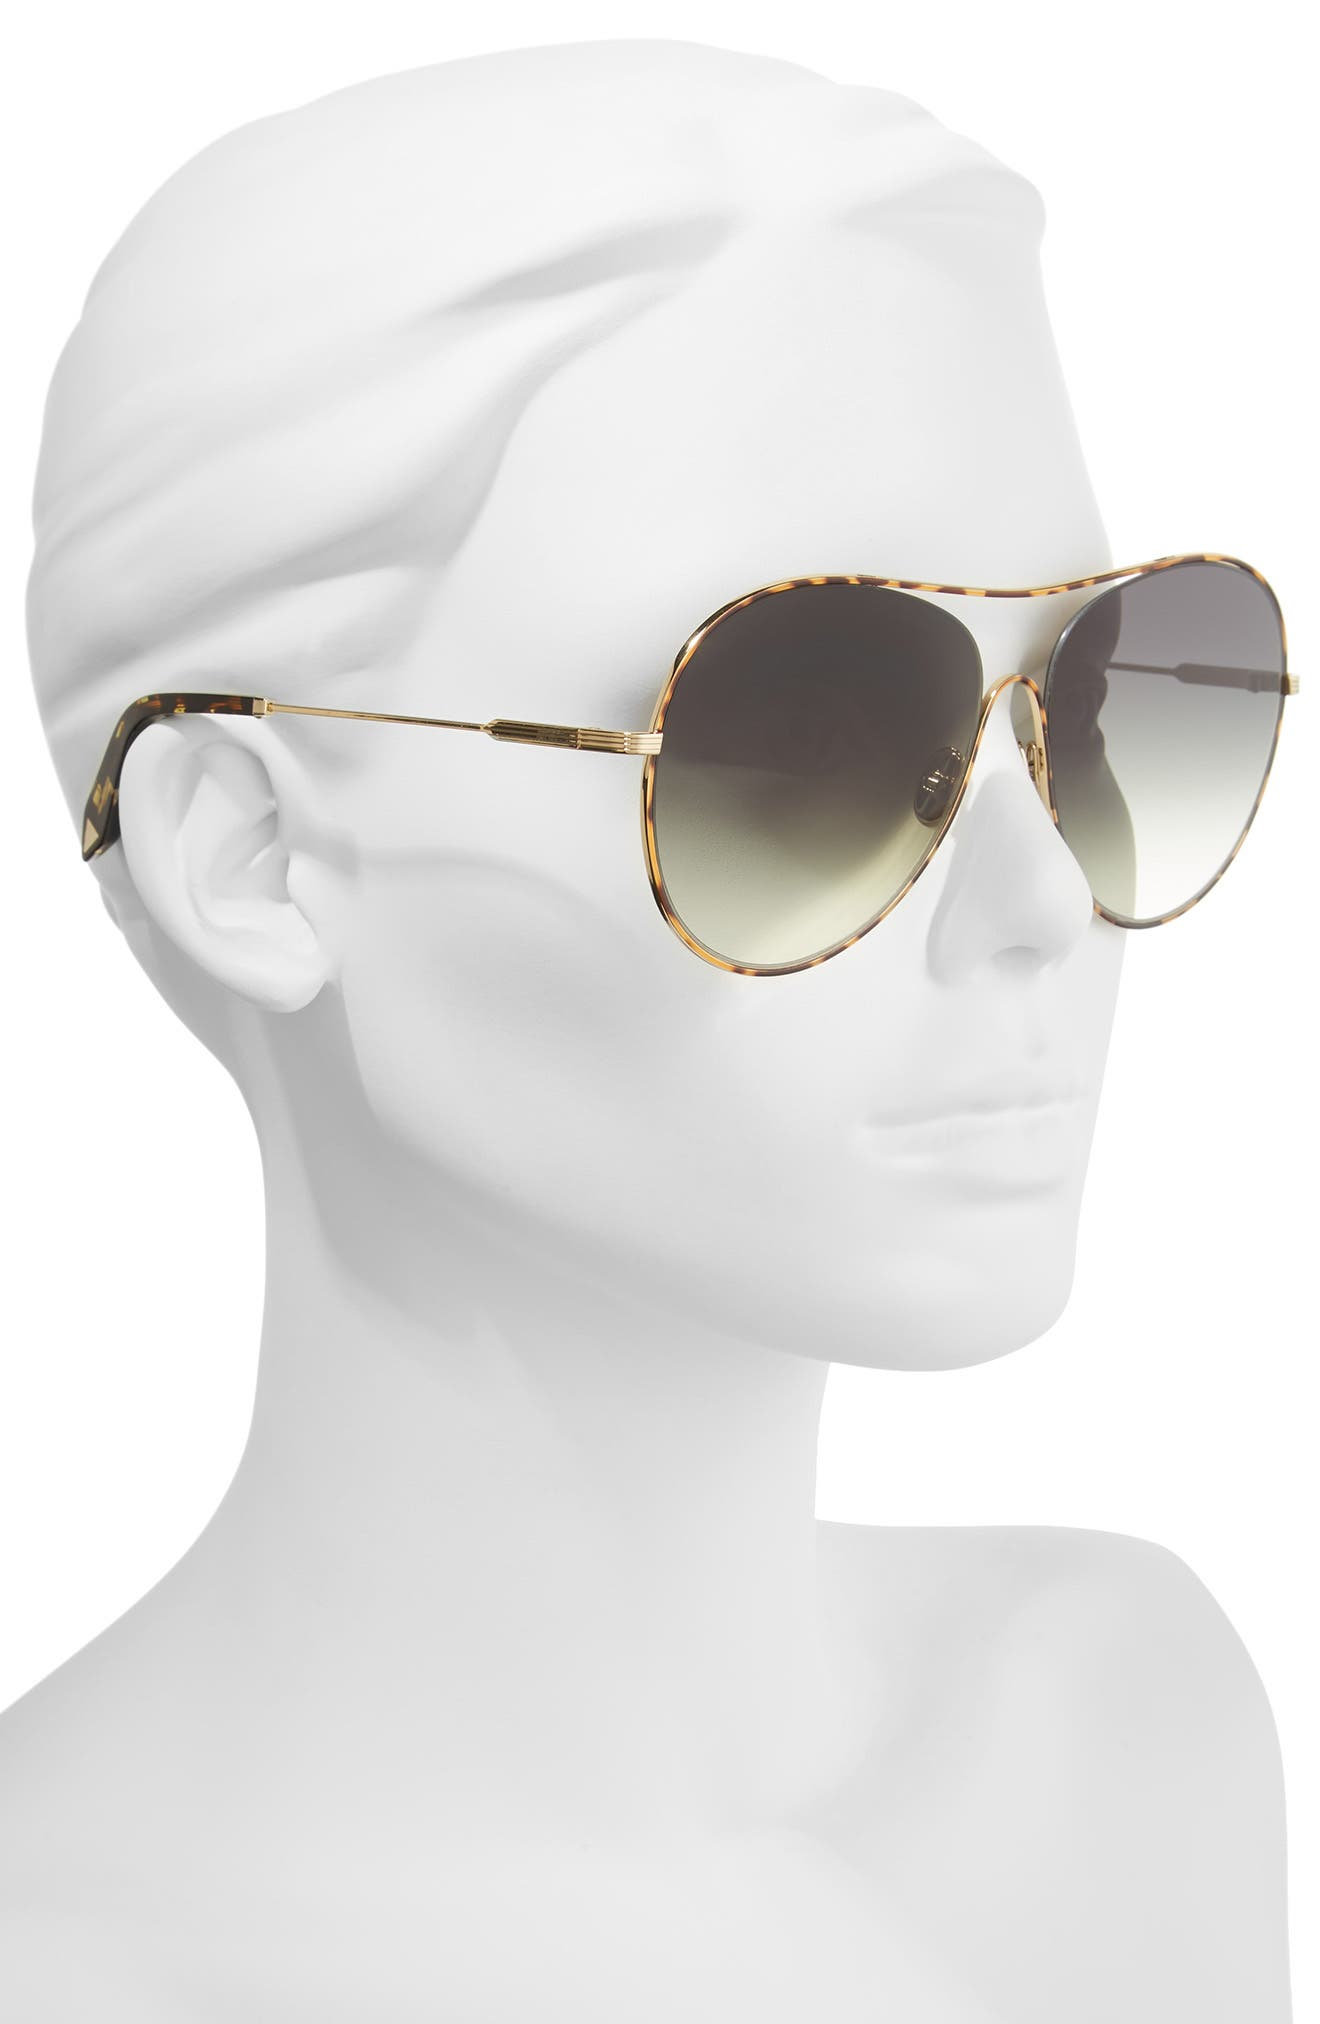 VICTORIA BECKHAM, Loop 63mm Oversize Round Sunglasses, Alternate thumbnail 2, color, AURORA